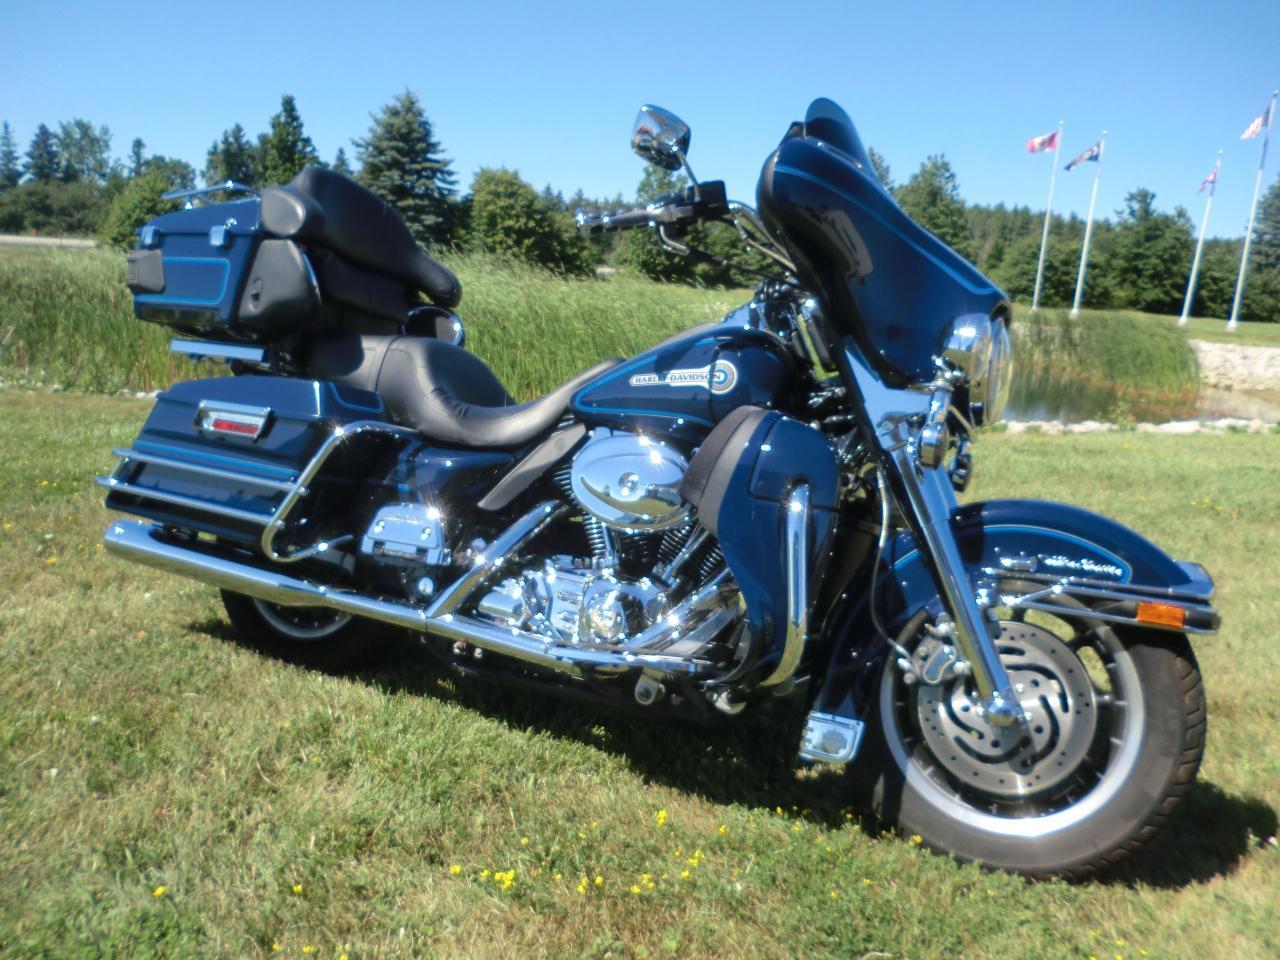 2005 Harley-Davidson ULTRA CLASSIC FLHTCUI ELECTRA GLIDE